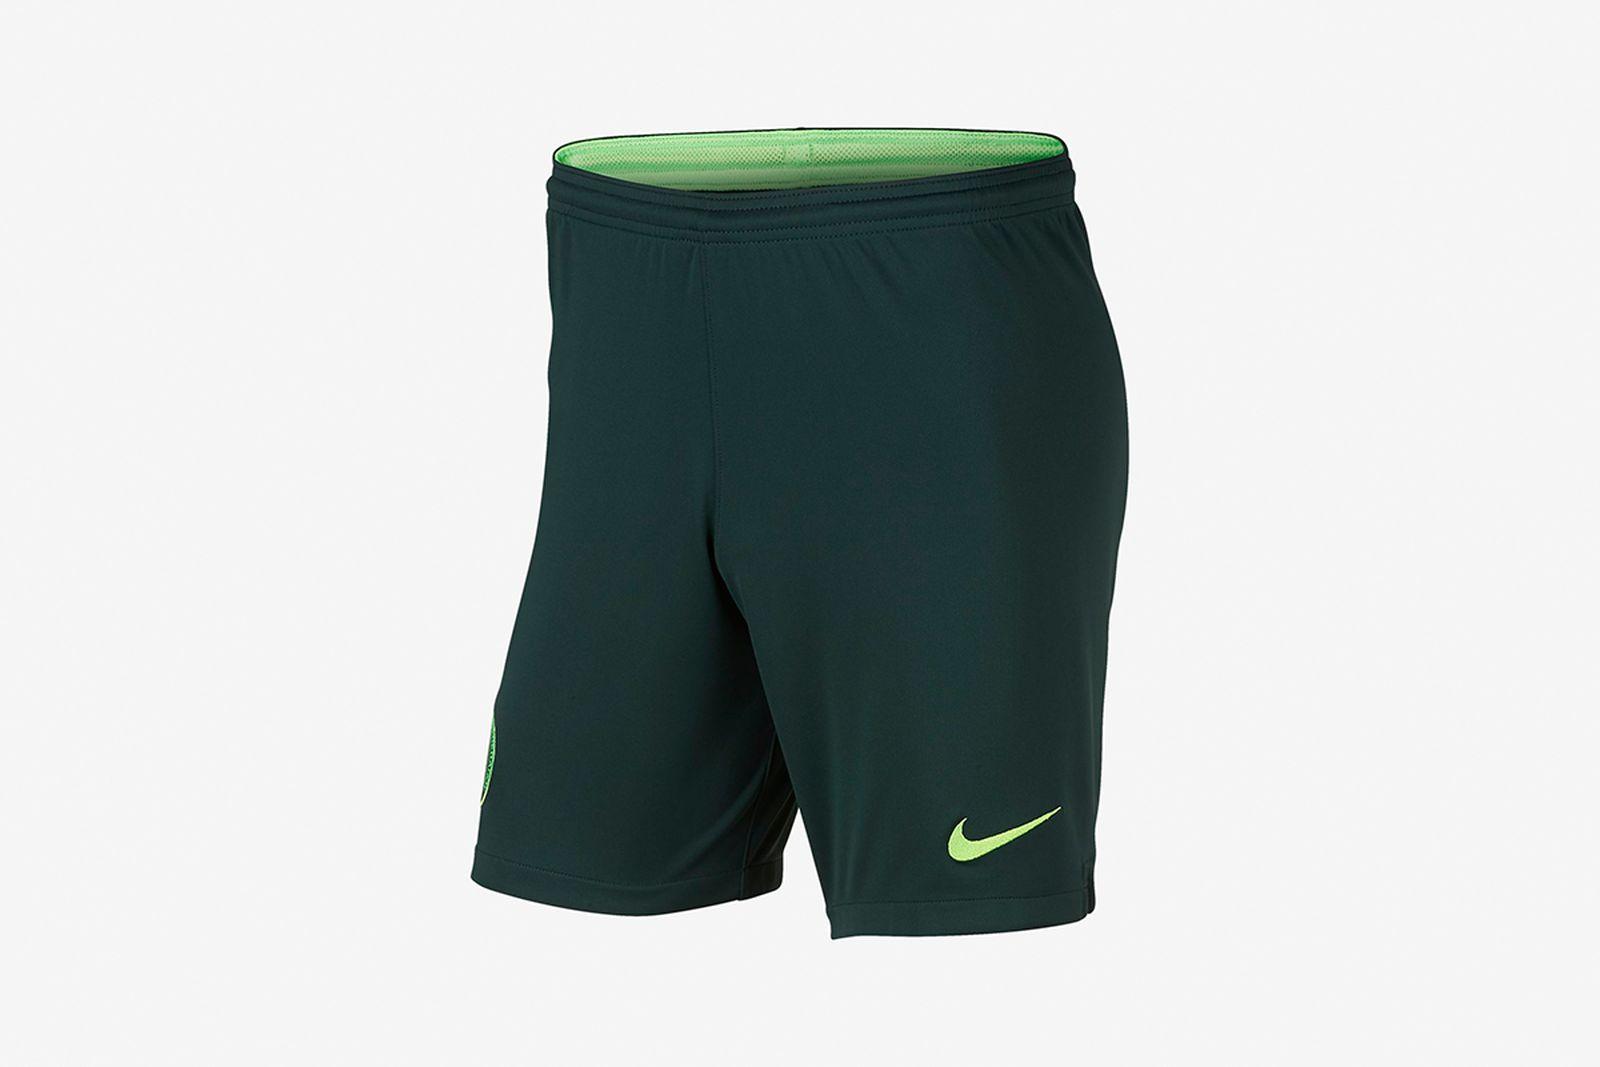 2018 nigeria stadium away shorts 2018 FIFA World Cup nigeria football kit